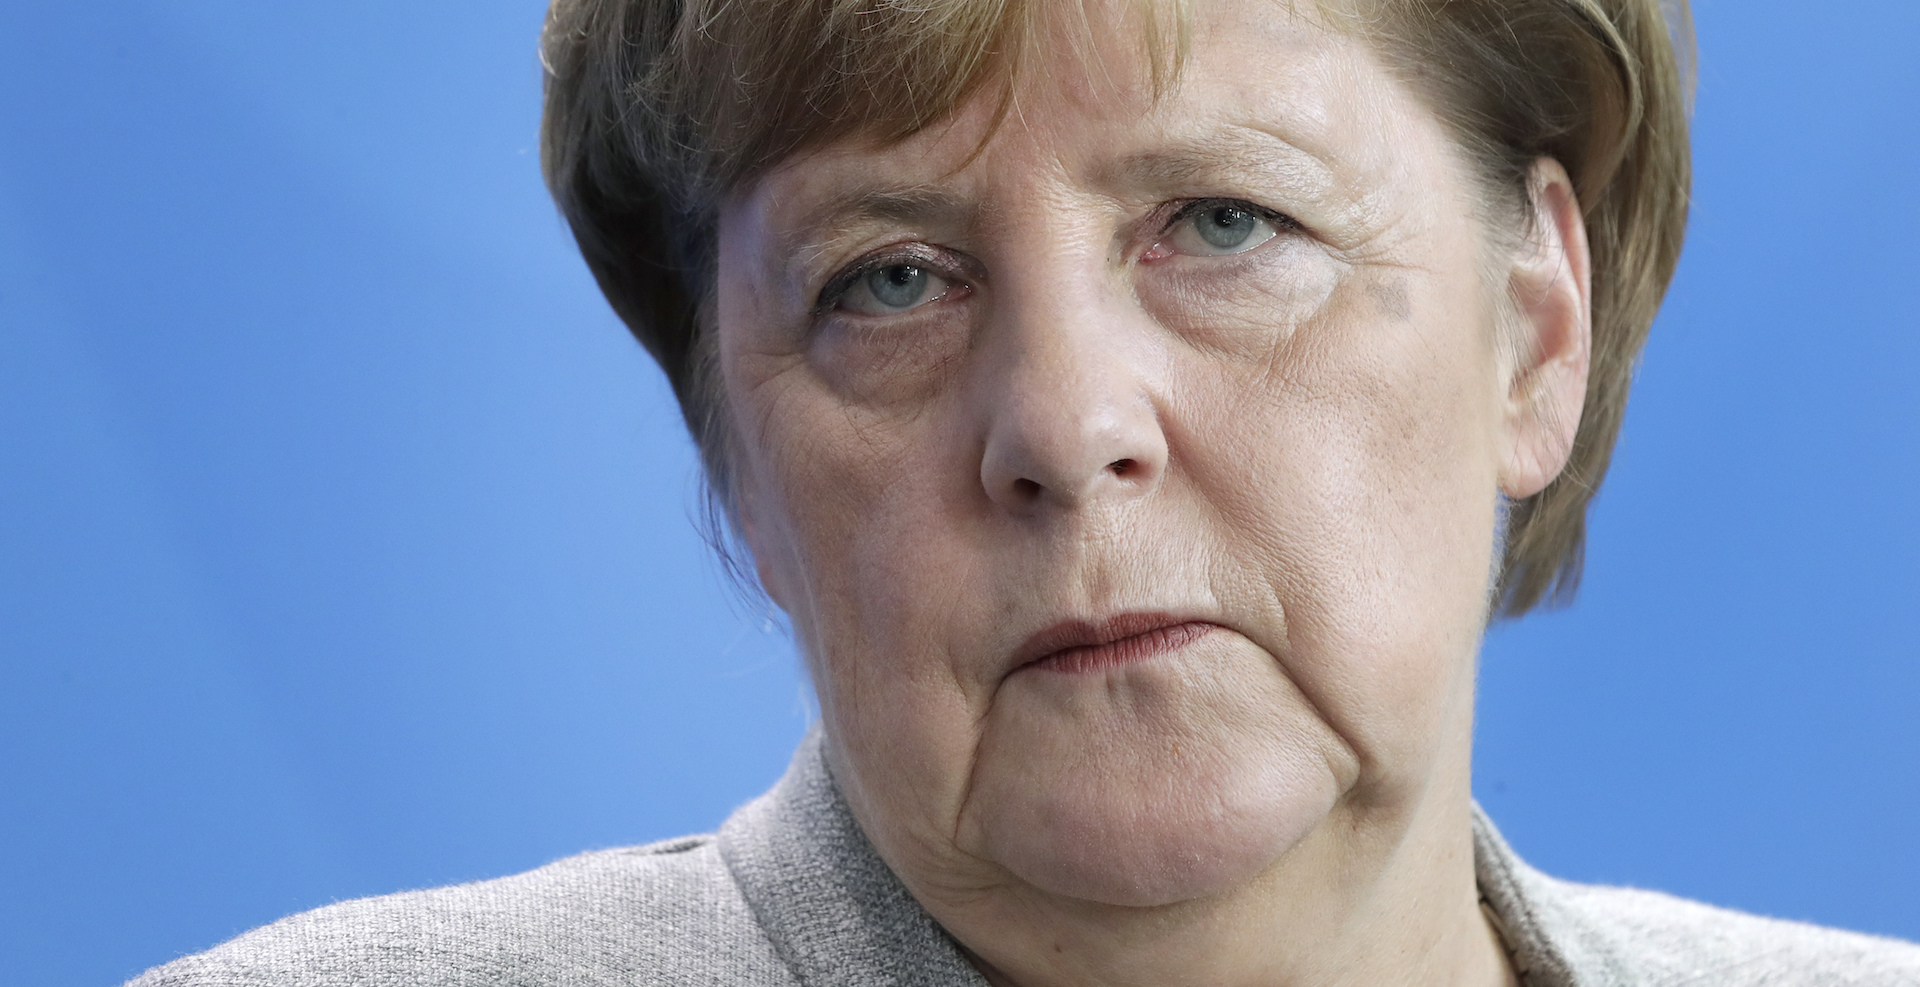 Angela Merkel nudes (24 photos), Sexy, Leaked, Twitter, swimsuit 2019